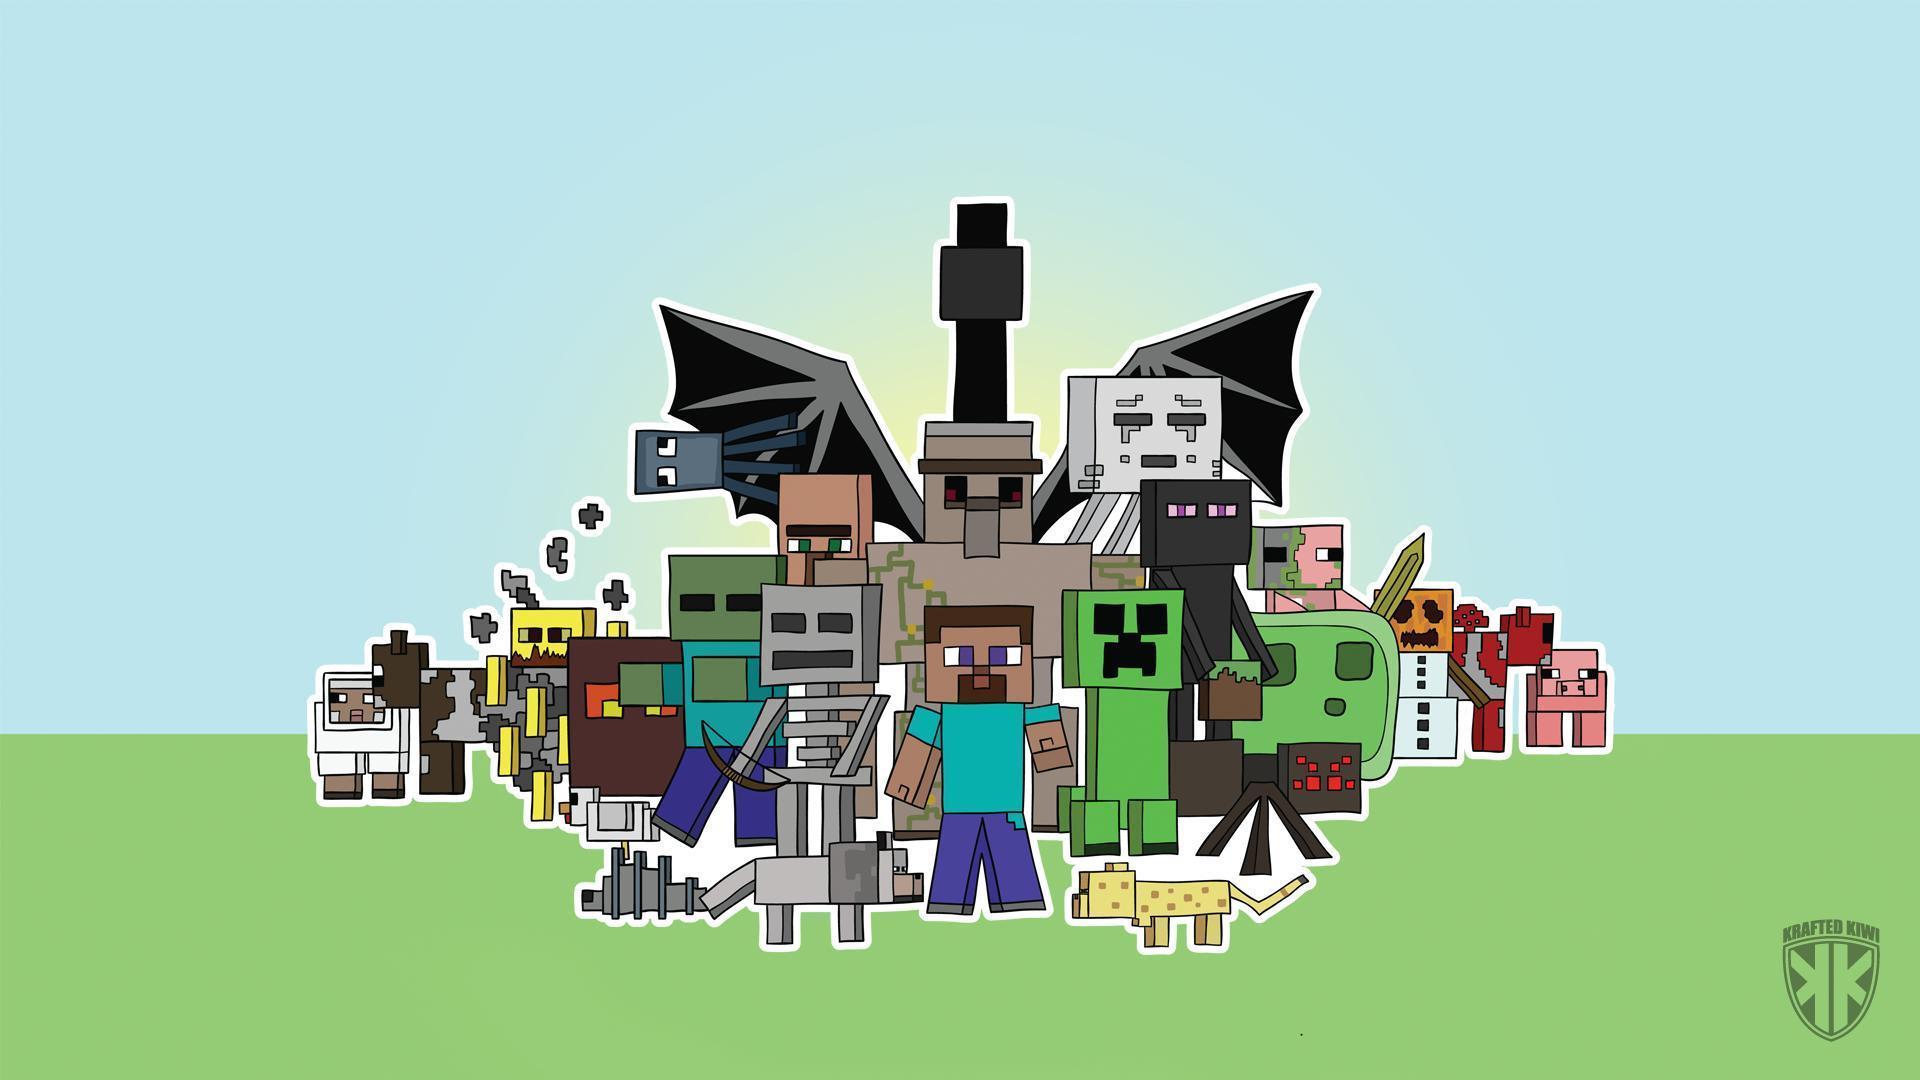 Fantastic Wallpaper Minecraft Kawaii - wc1687944  Best Photo Reference_195320.jpg